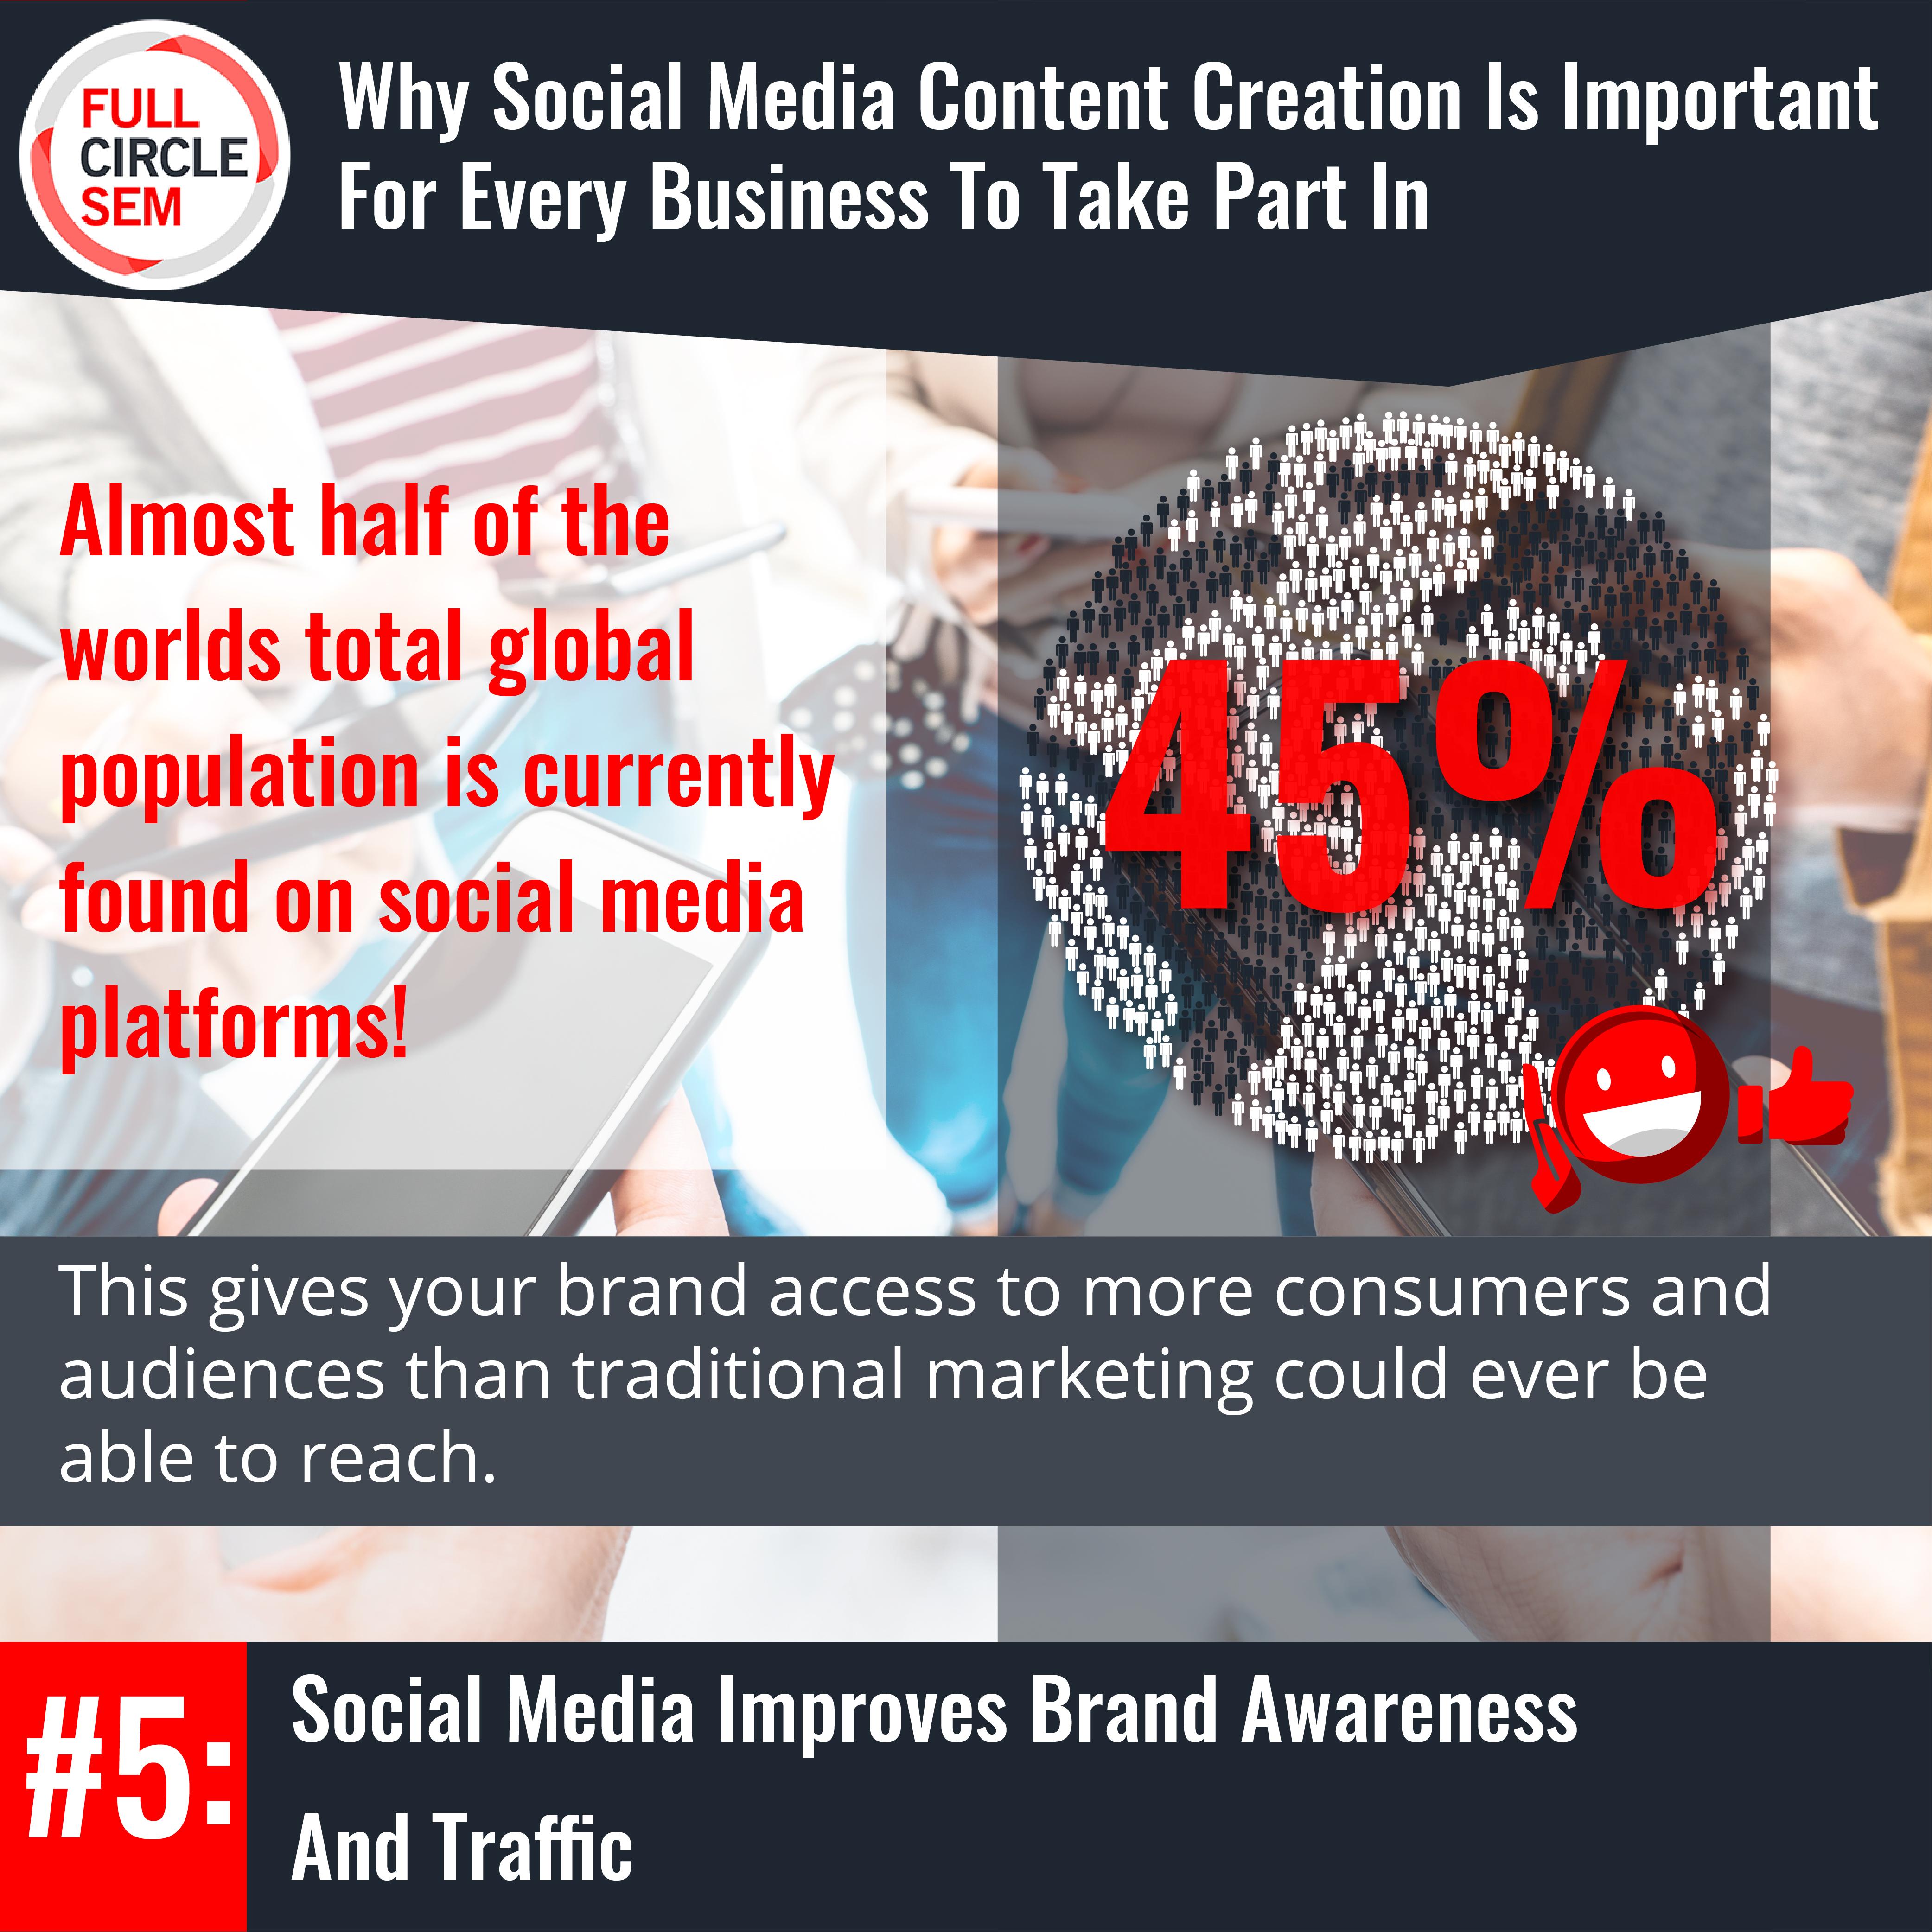 improve brand awareness and website traffic